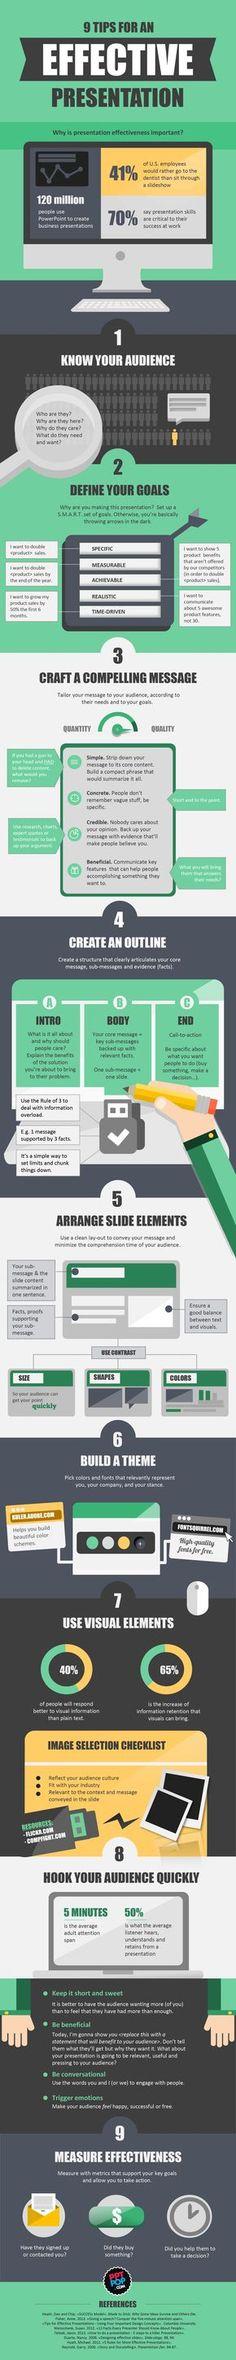 9 Tips for an Effective Presentation #infographic #Presentation #Sales #Career